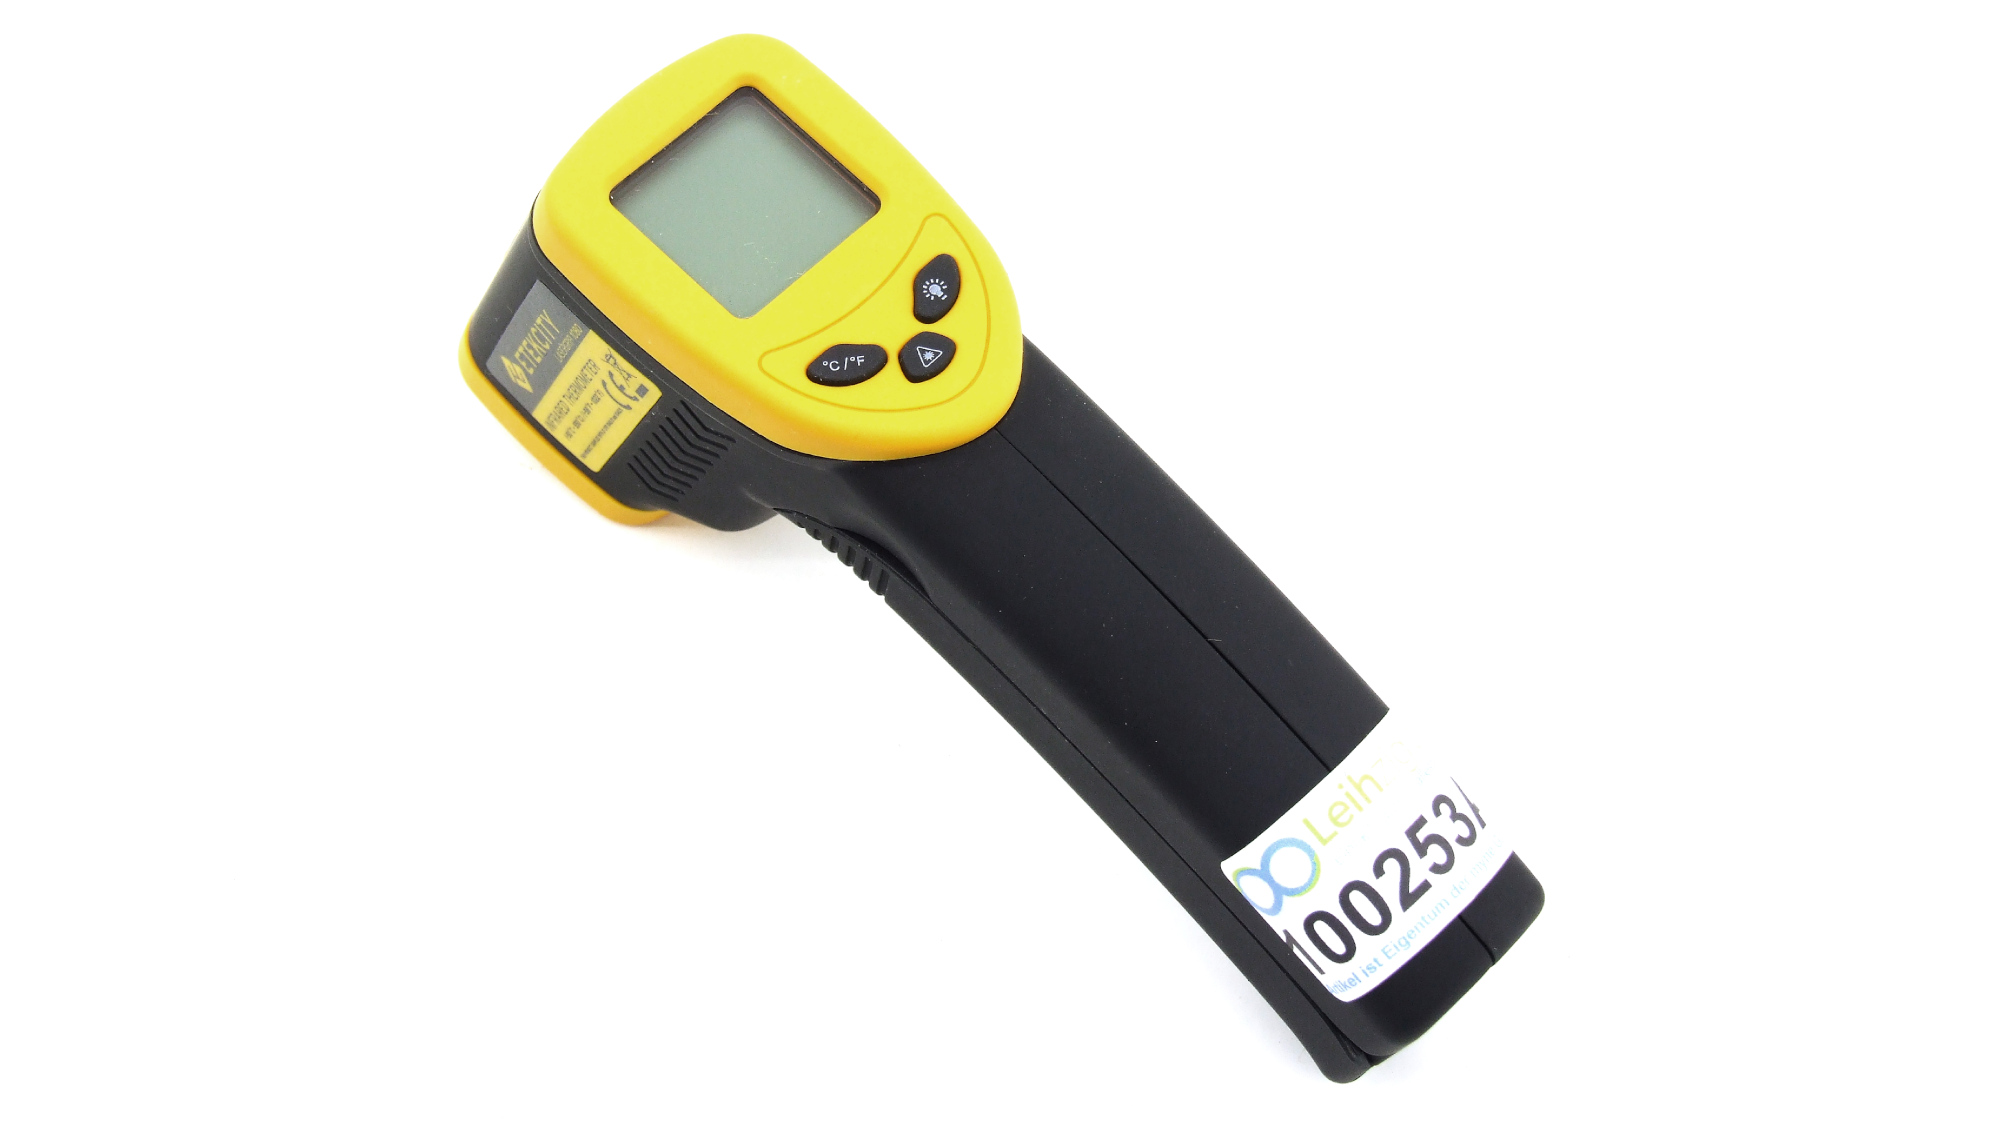 Infrarot-Thermometer leihen